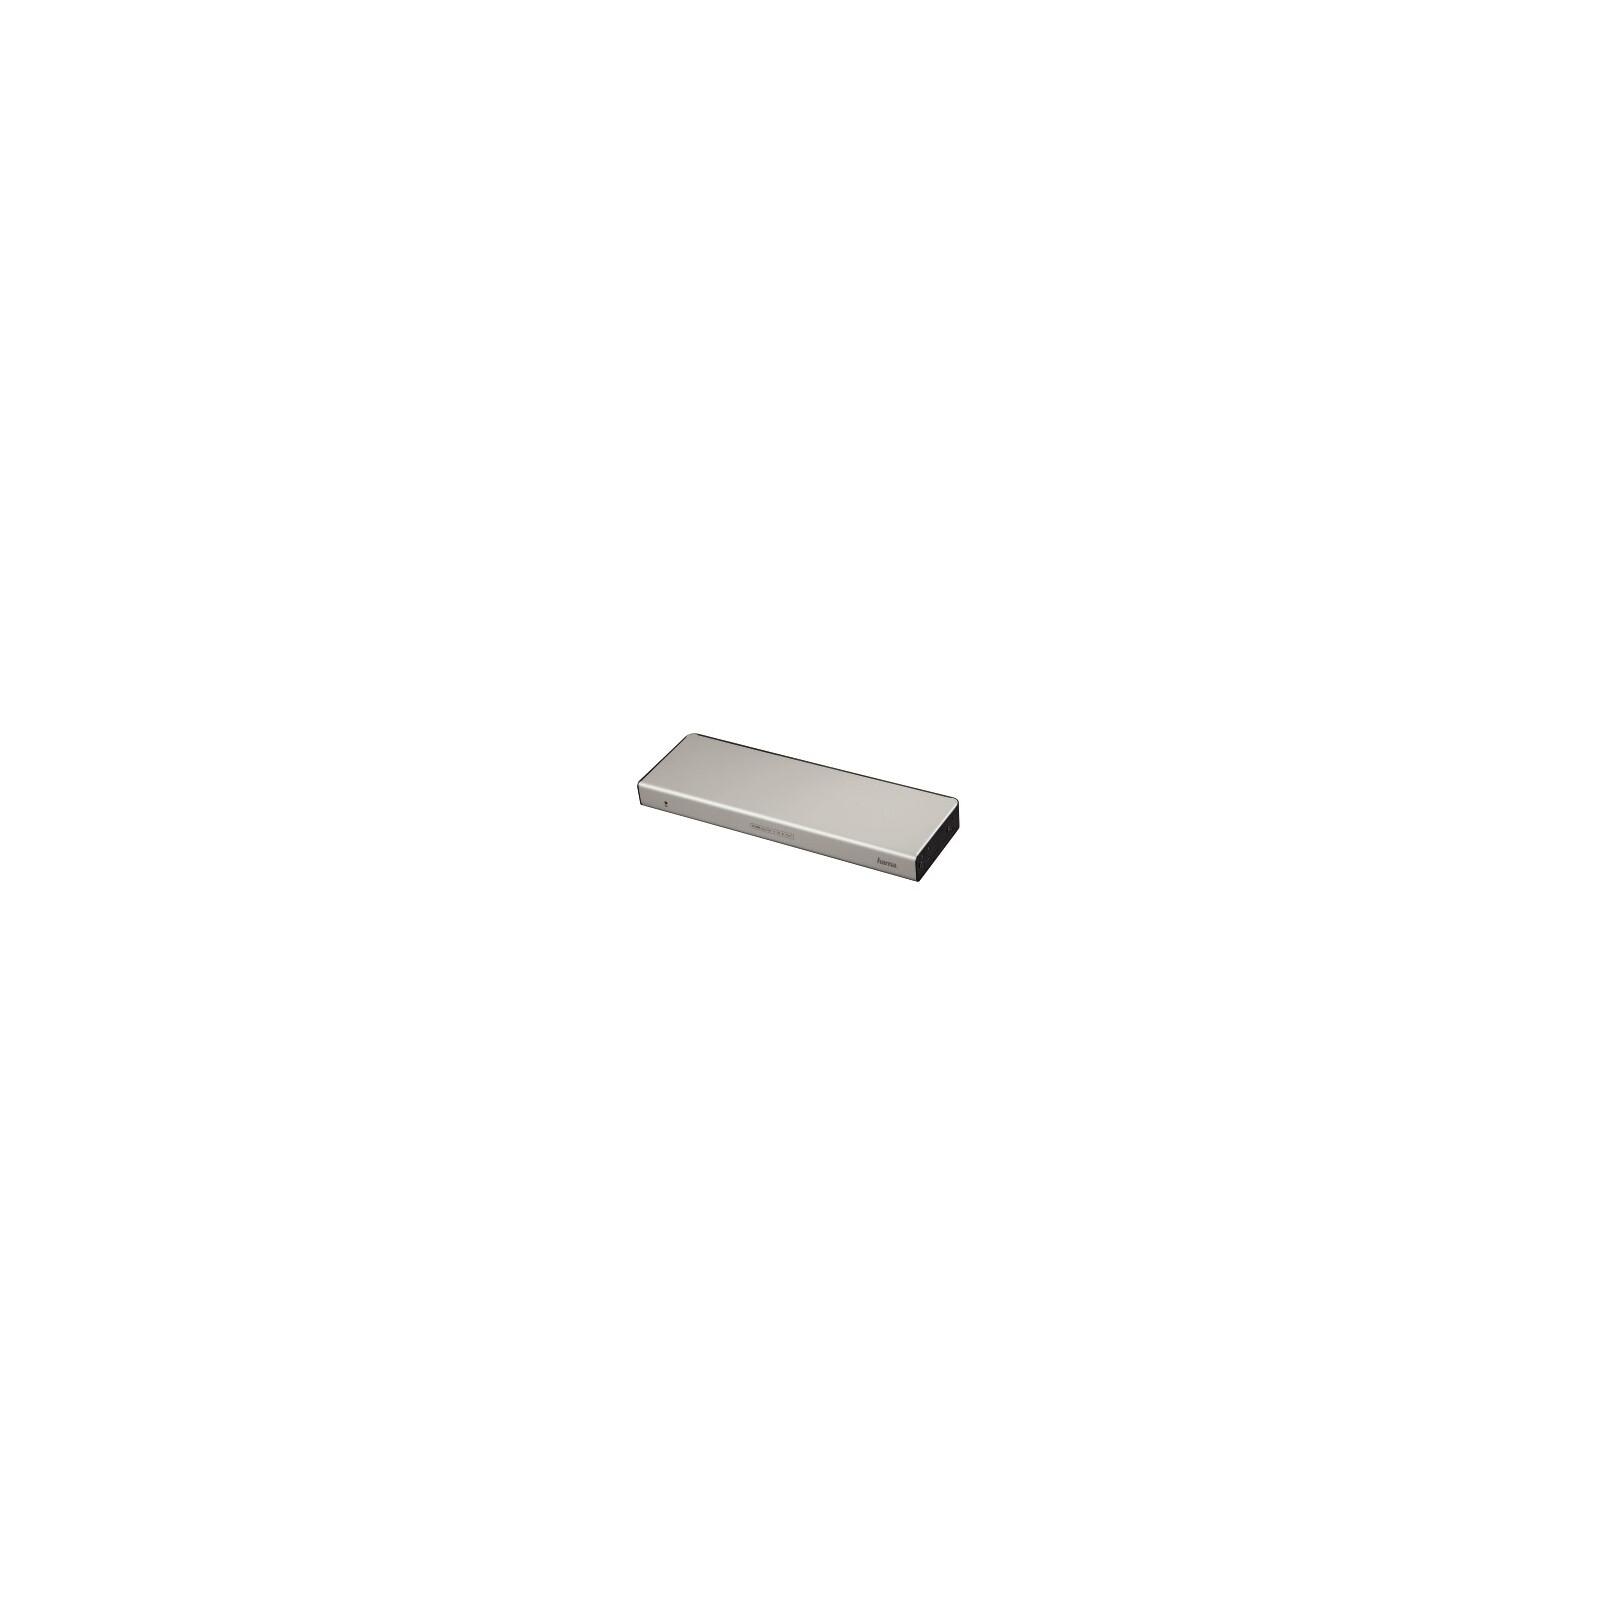 Hama 42558 HDMI Verteilstärker